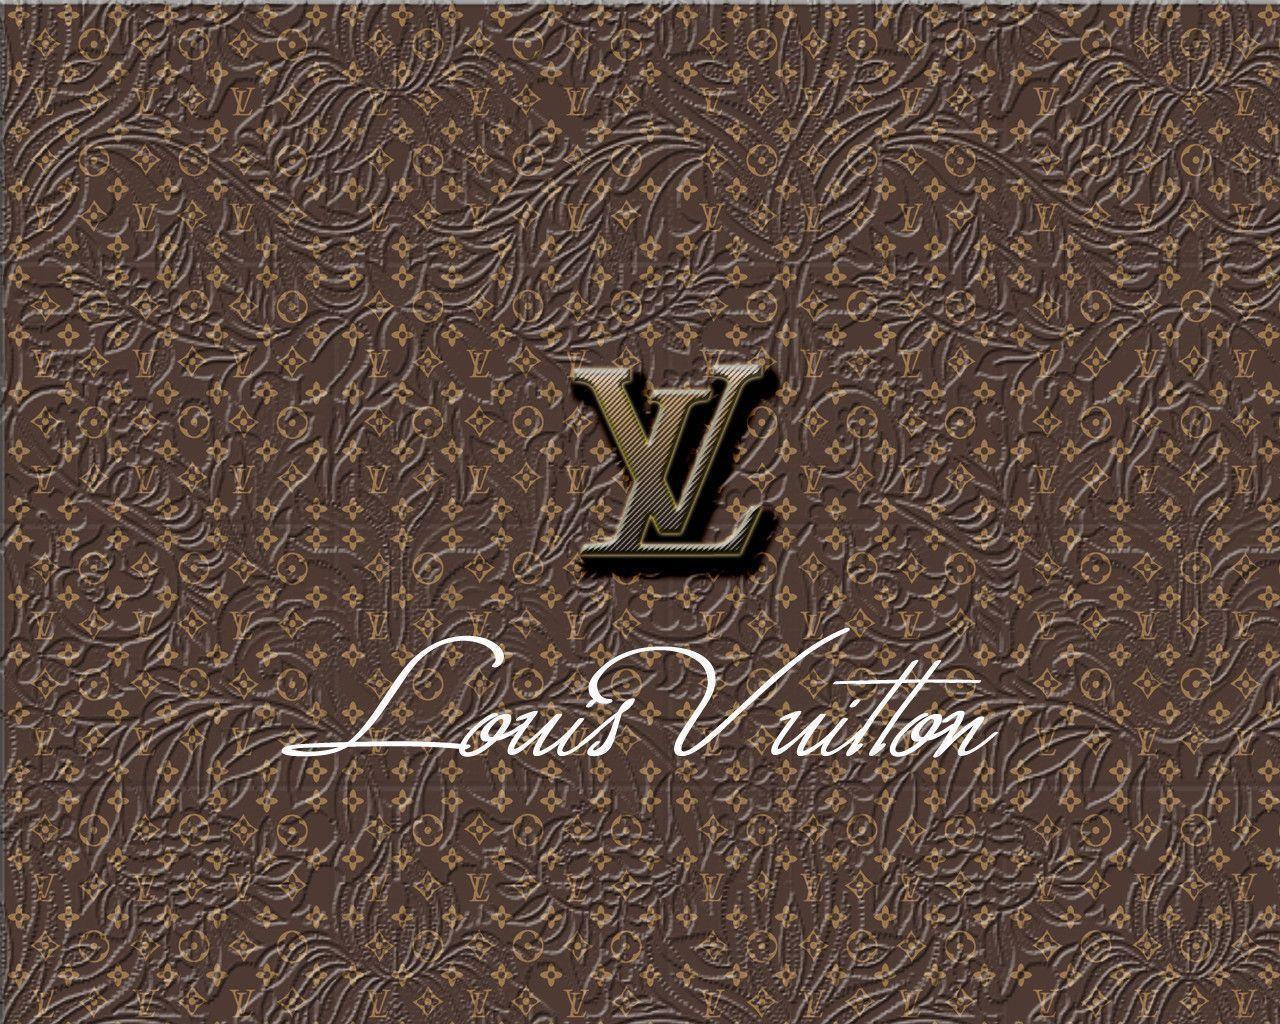 Wallpapers For > Louis Vuitton Wallpaper Gold